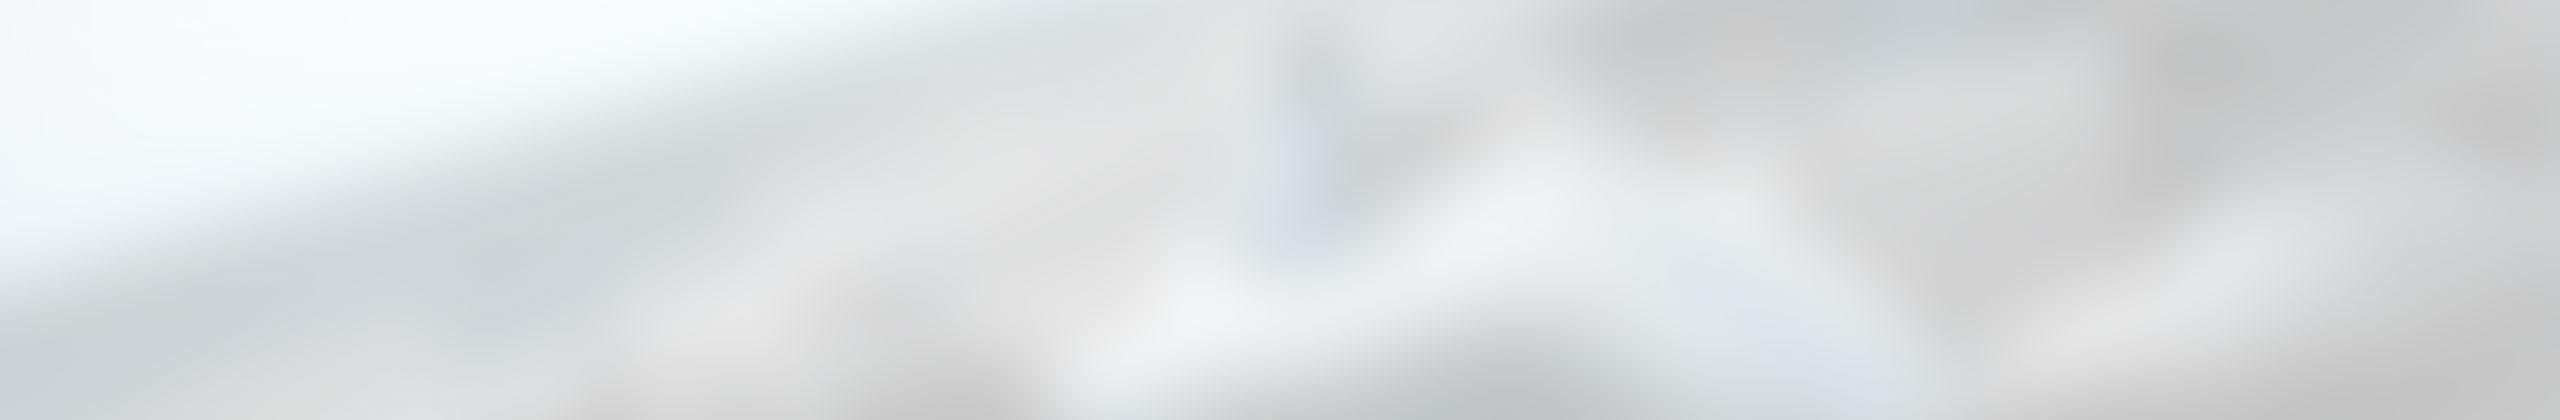 whitepaper1508_backdrop